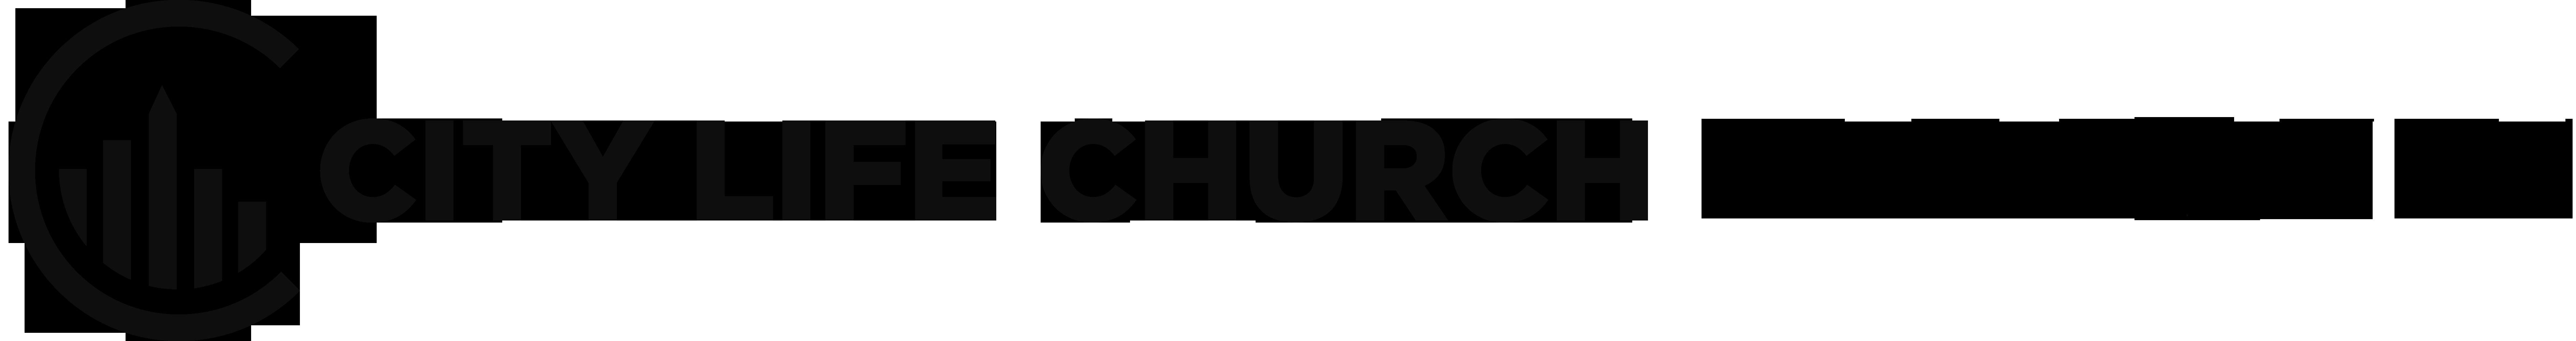 City Life Church Eindhoven